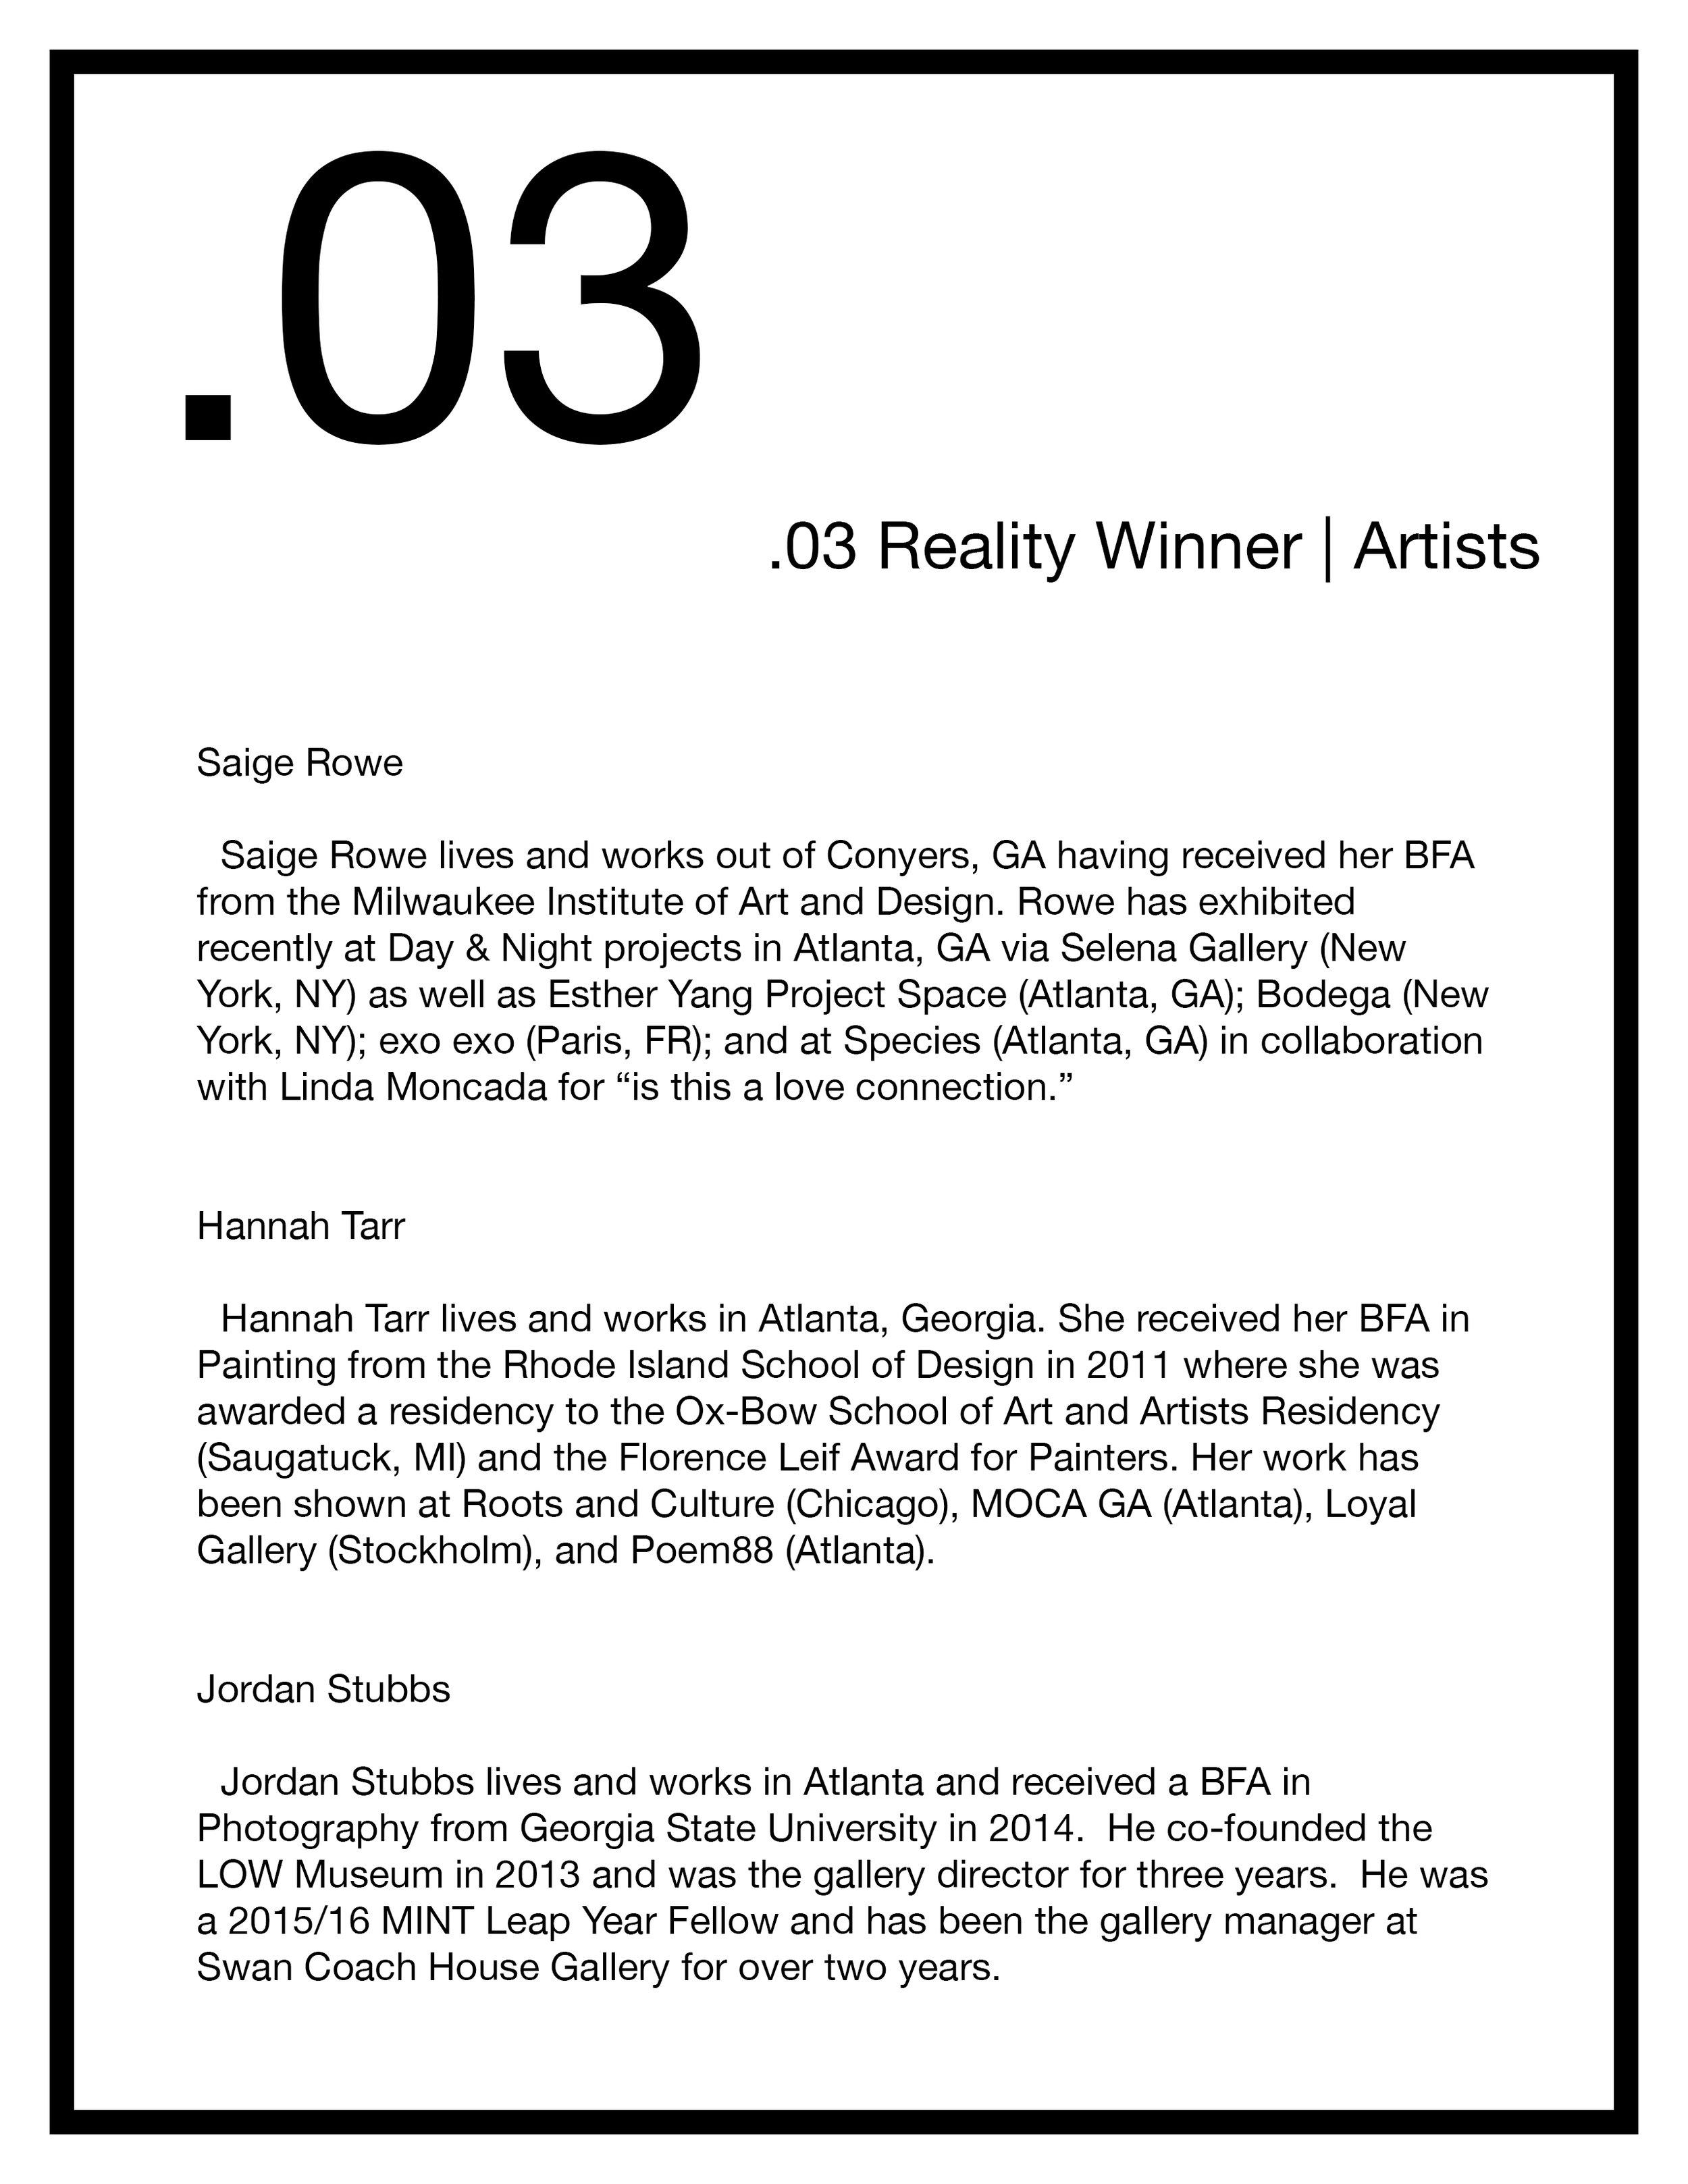 035 reality f artist bios 1.jpg